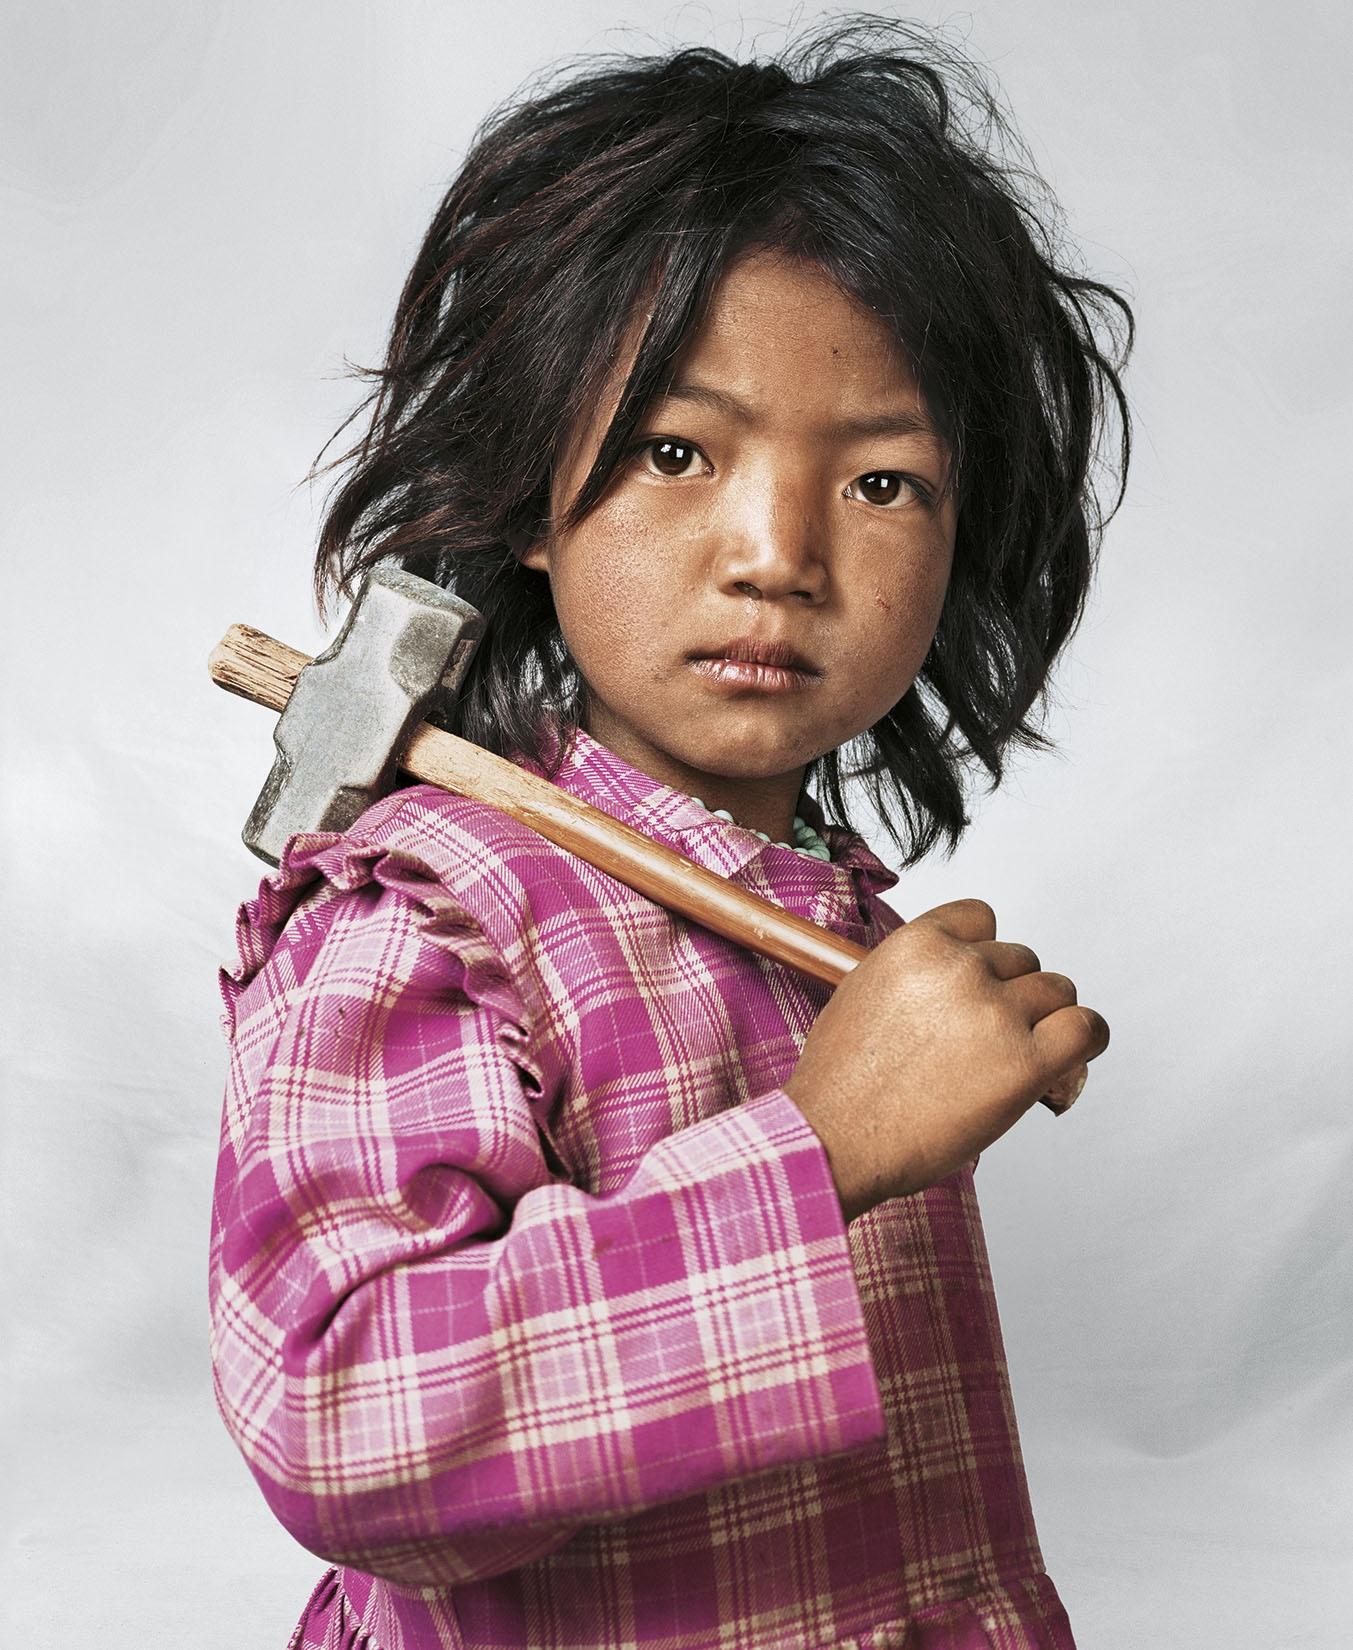 Indira. Kathmandu, Nepal. March, 2007 © James Mollison courtesy Aperture